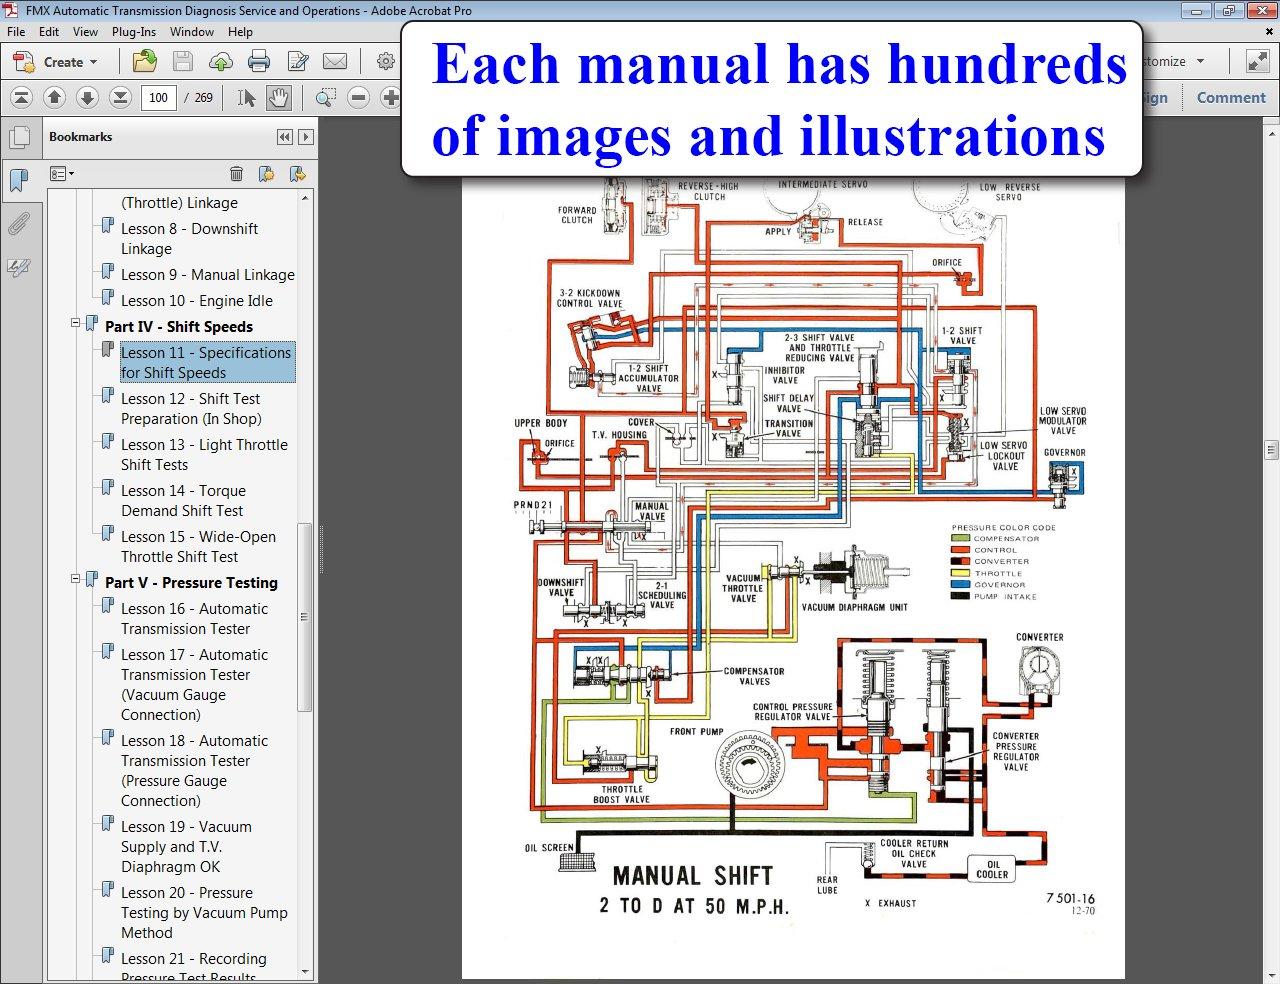 FMX Automatic Transmission Diagnosis, Service, and Training Manual: Ford  Motor Company: 9781603711999: Amazon.com: Books